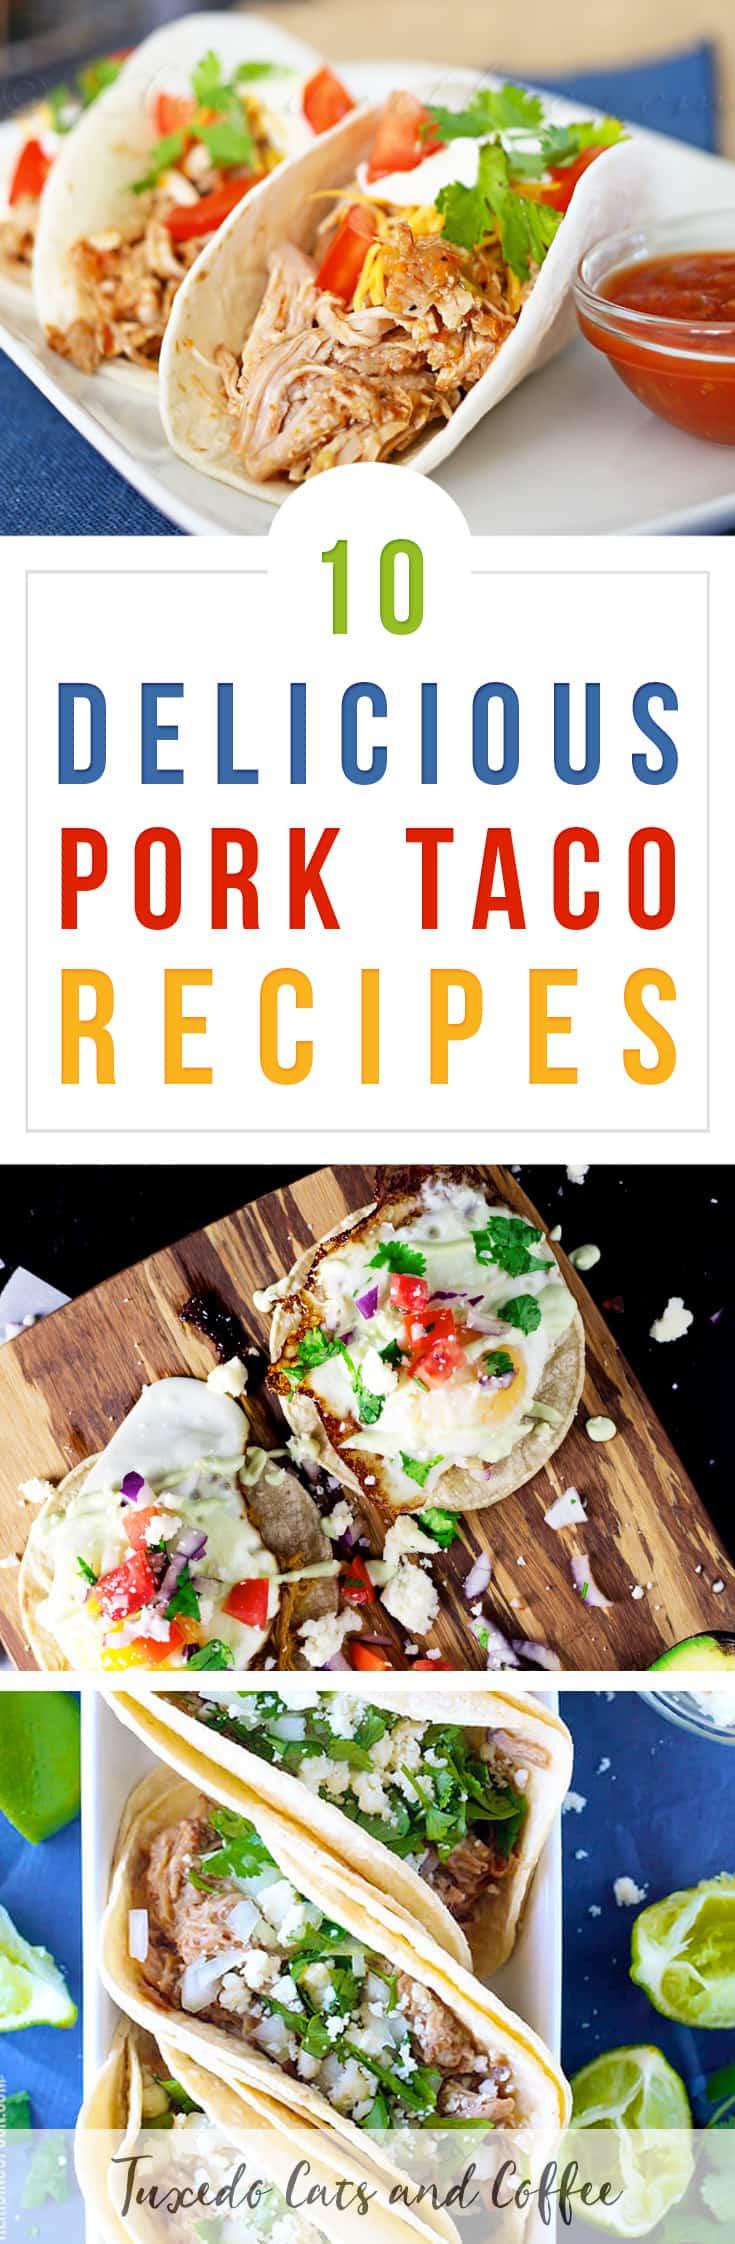 10 Delicious Pork Taco Recipes - Tuxedo Cats and Coffee